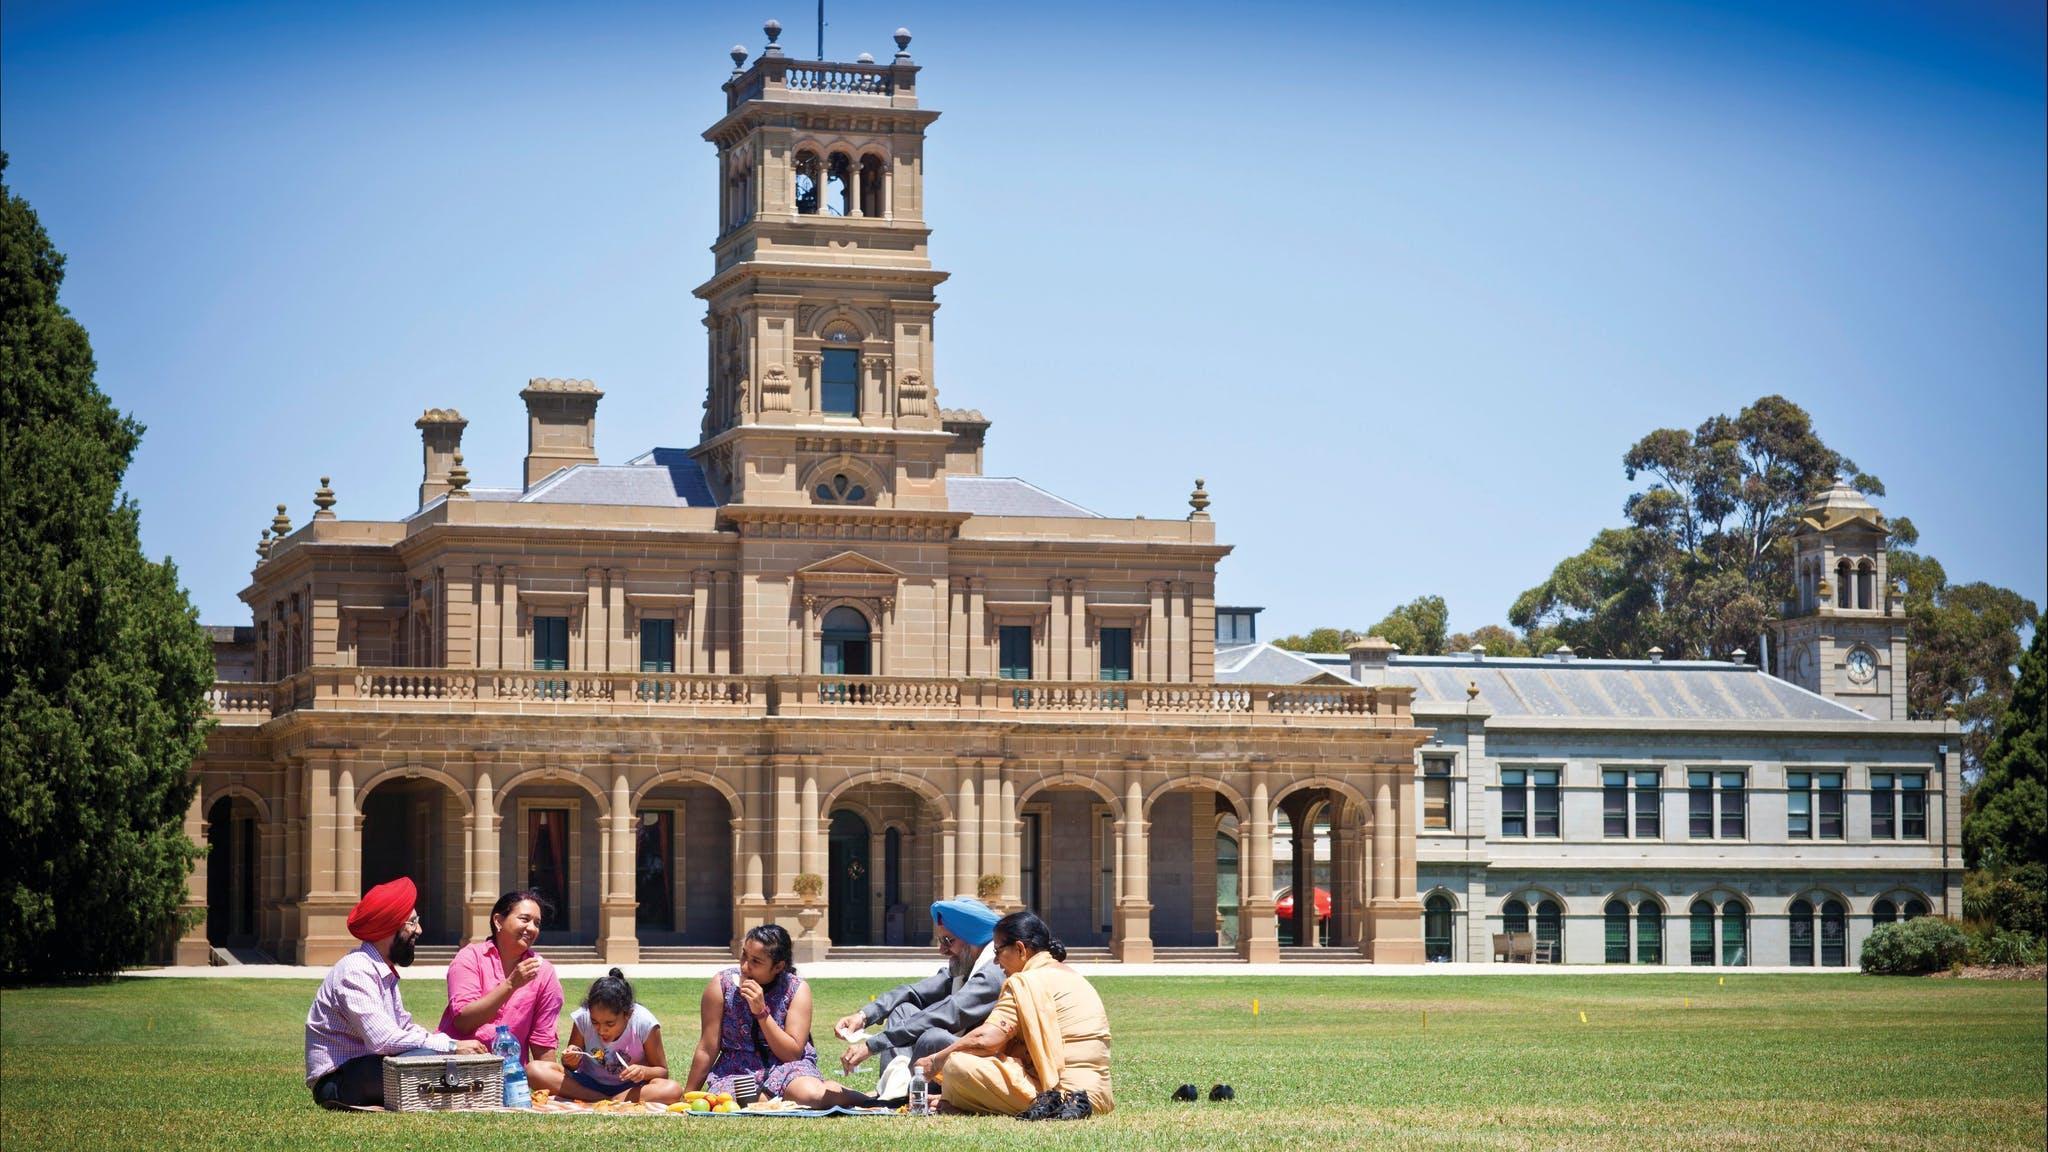 Werribee Park and Mansion, Attraction, Melbourne, Victoria, Australia